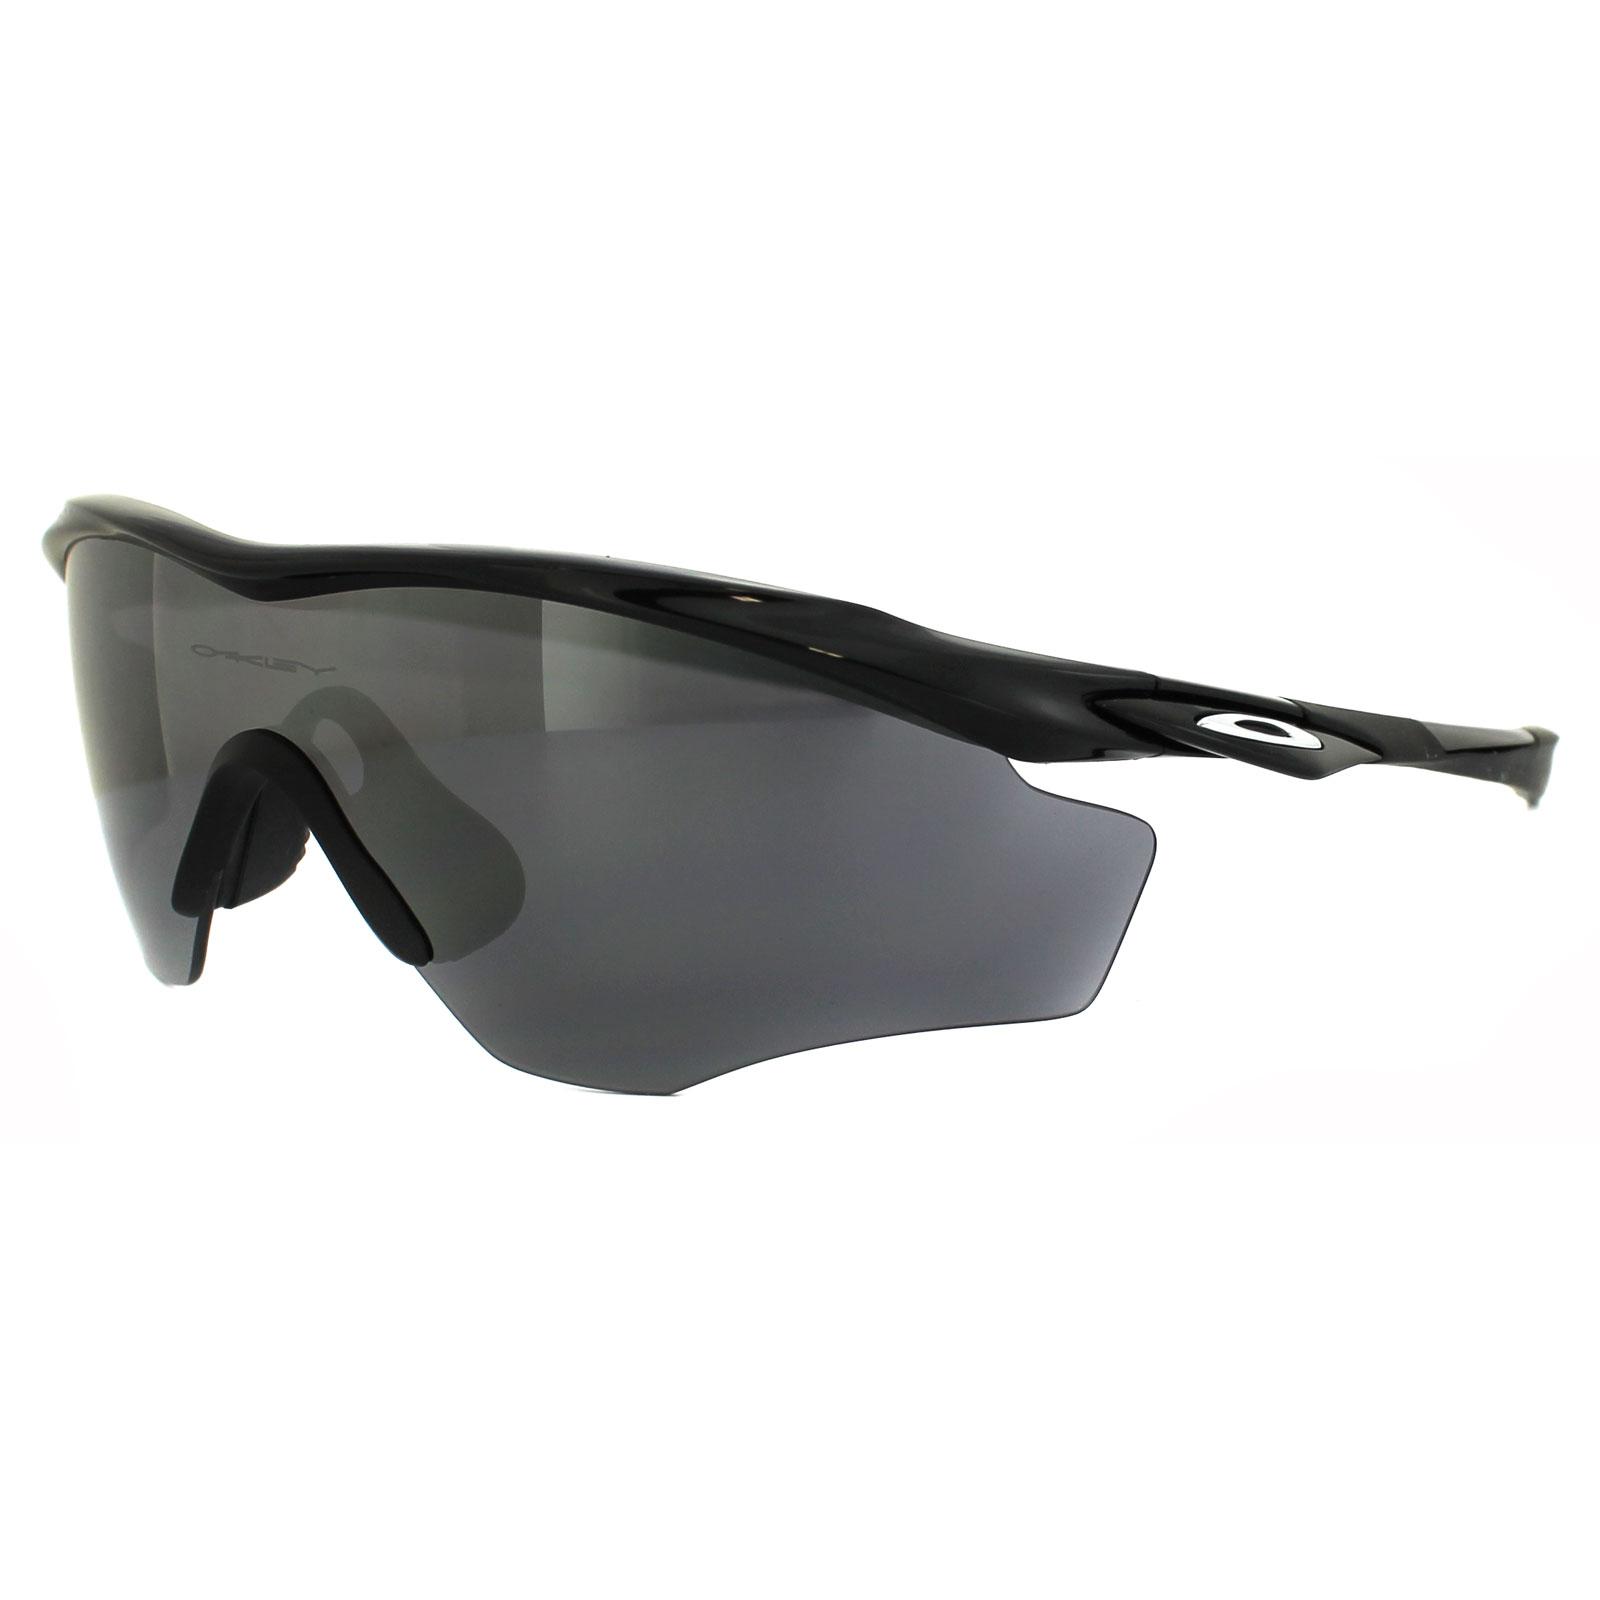 99b0162191d Oakley M2 Frame Sunglasses - Iridium Polarized Iridium Polarized Black